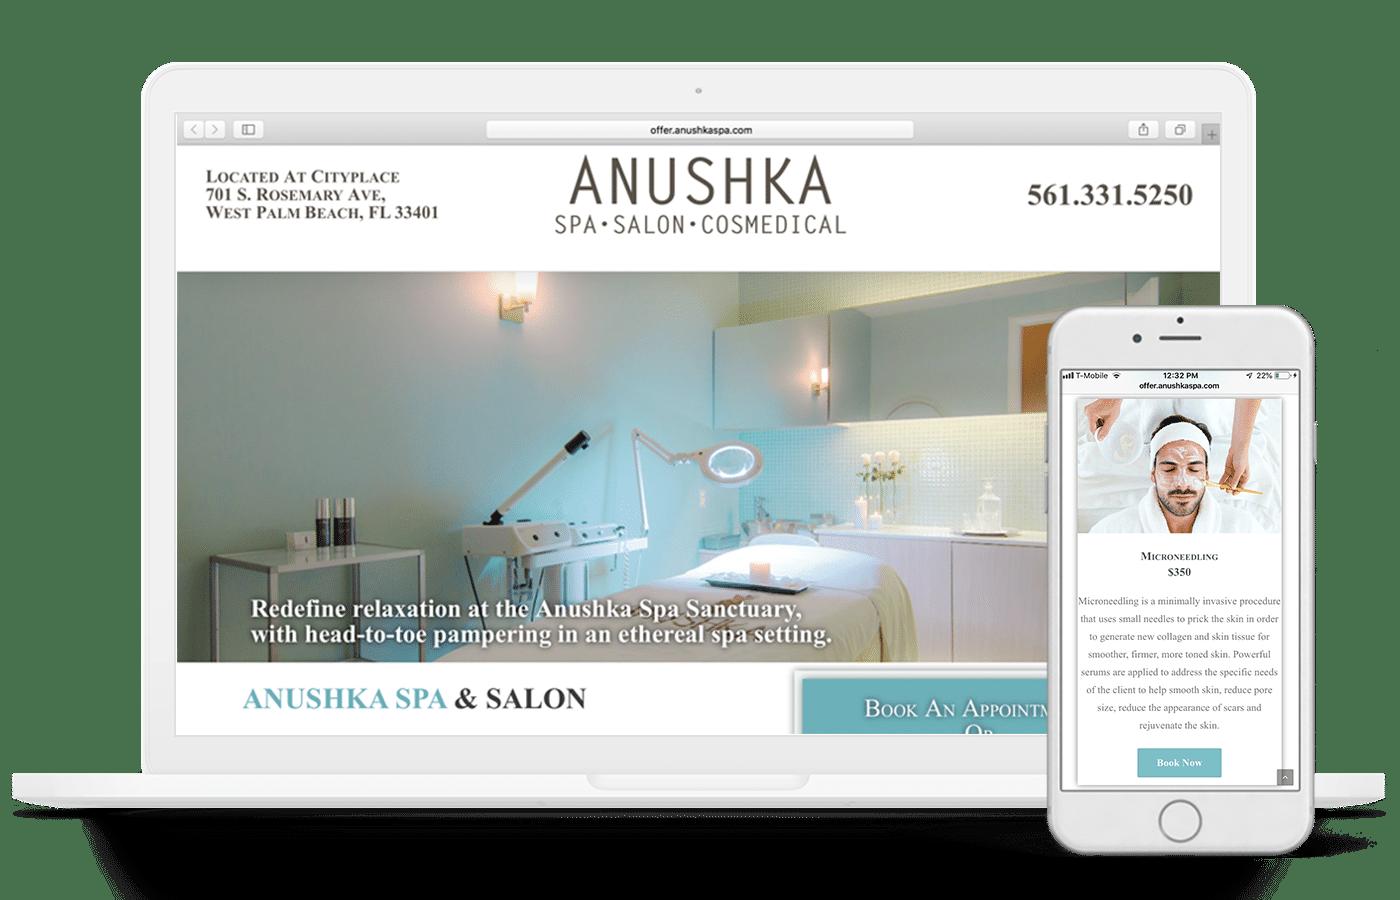 Anushka Website mobile optimized SEO